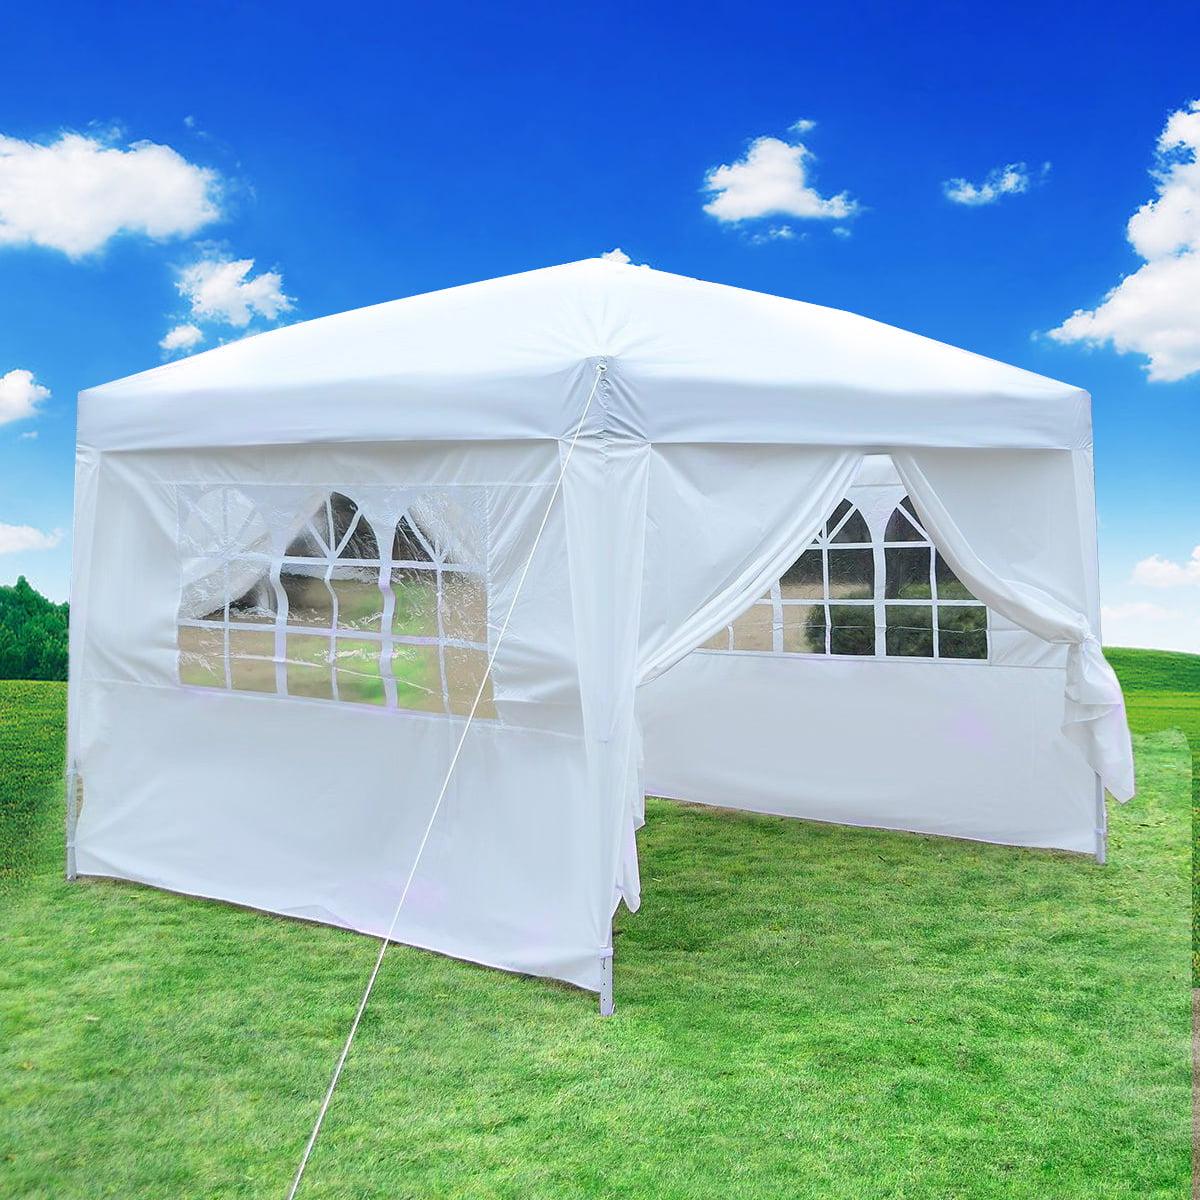 eWarehouseDirect Outdoor 10â€X10†Canopy EZ POP UP Tent Gazebo Wedding Party Shelter Carry Bag by